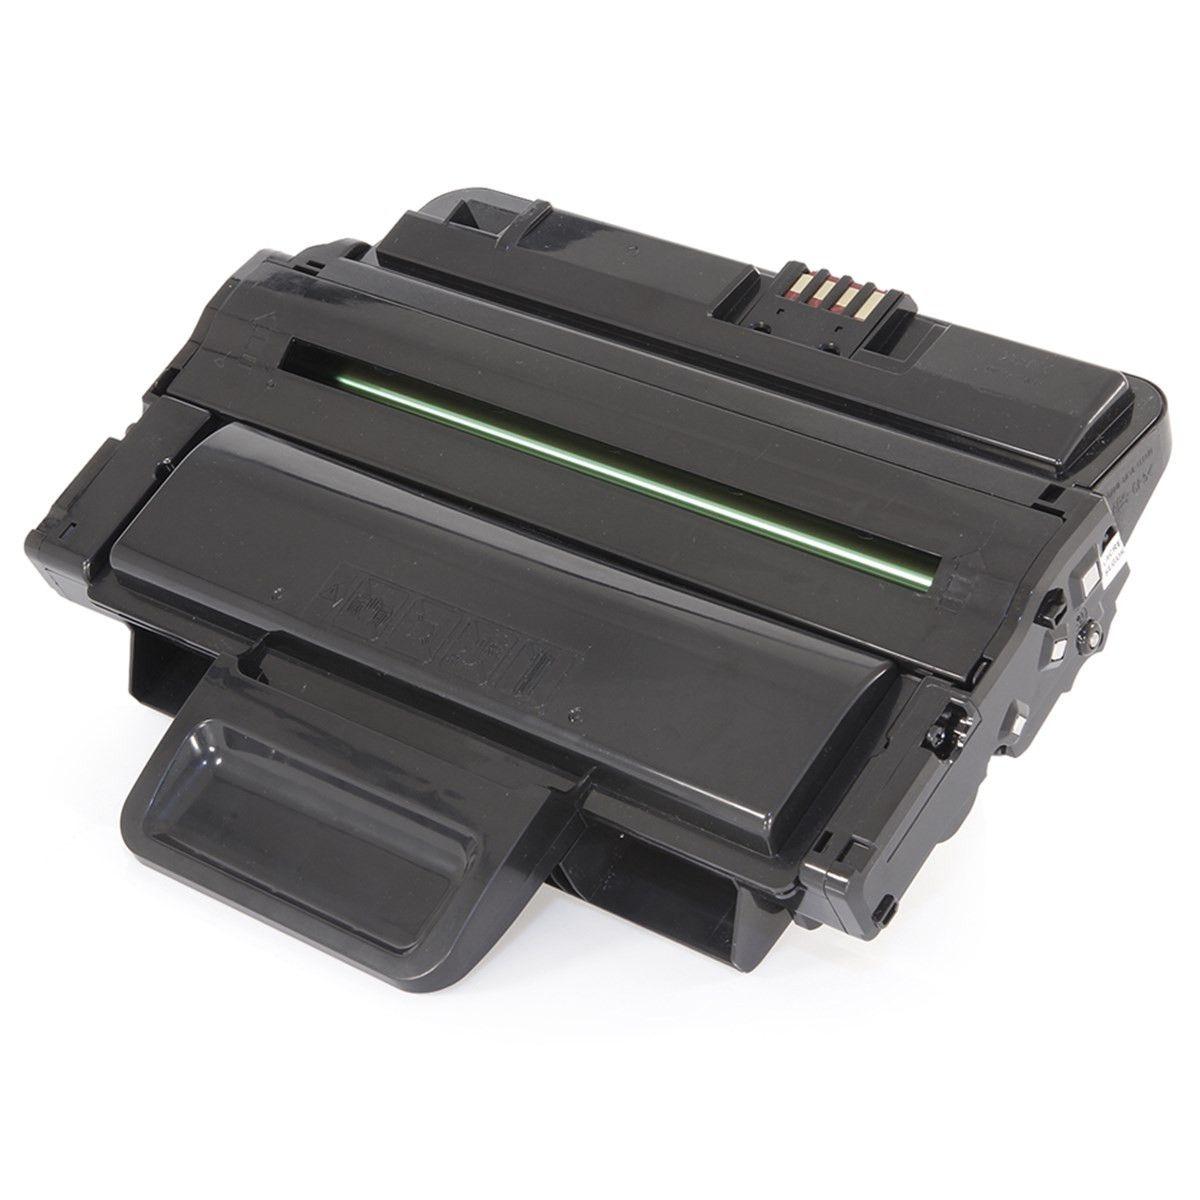 Toner compatível com XEROX 3250 3250D 3250DN 106R01374 Black 5.000 Páginas - Cartucho & Cia